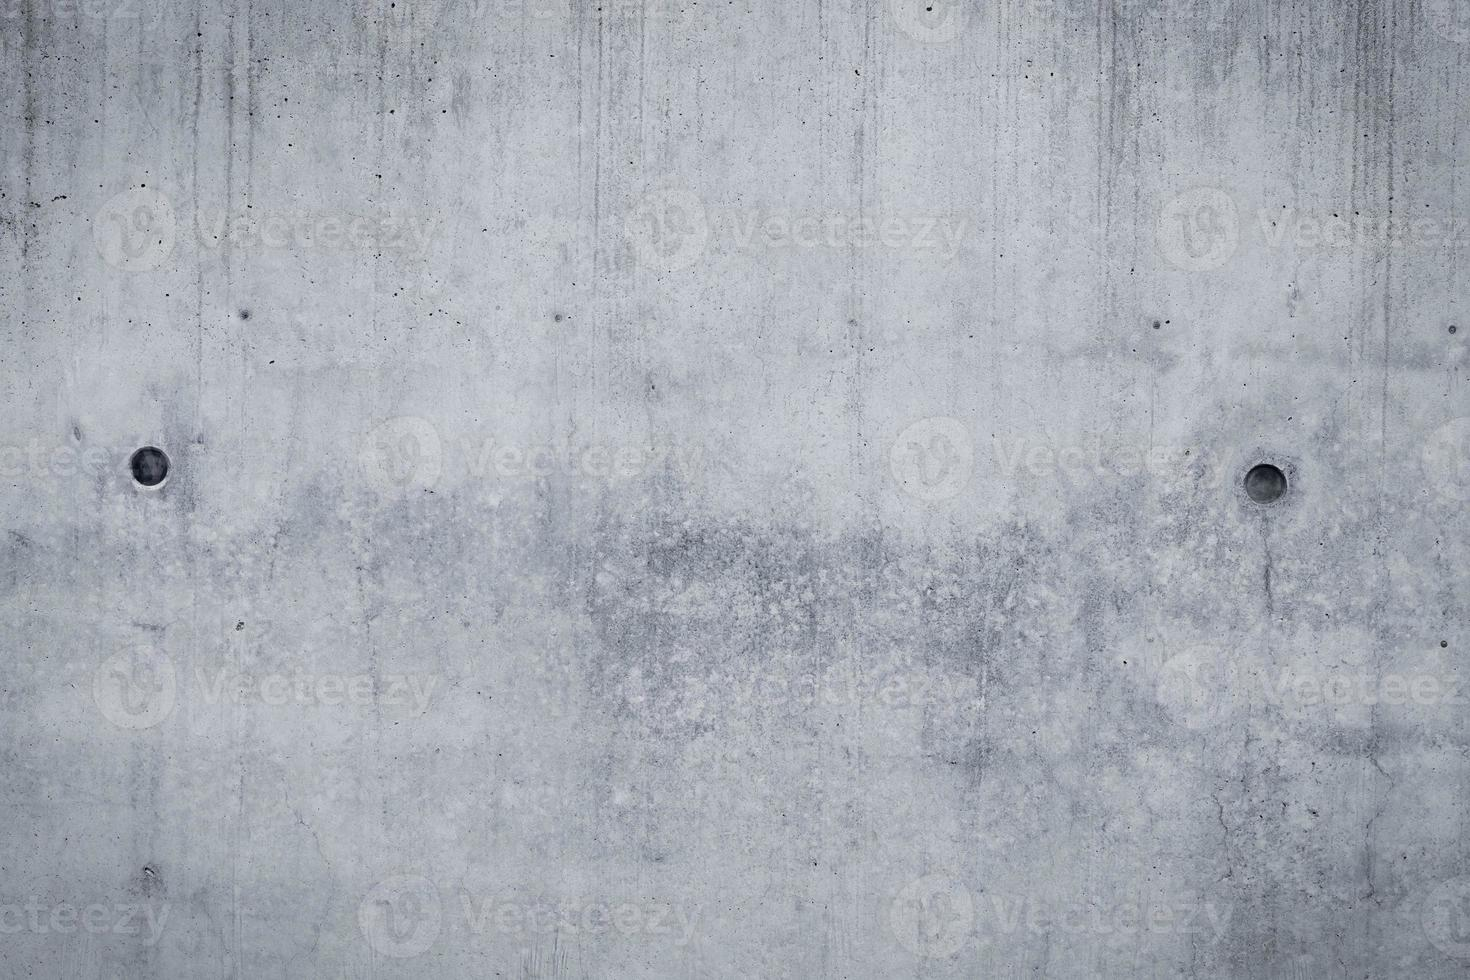 grungy betongväggstextur foto